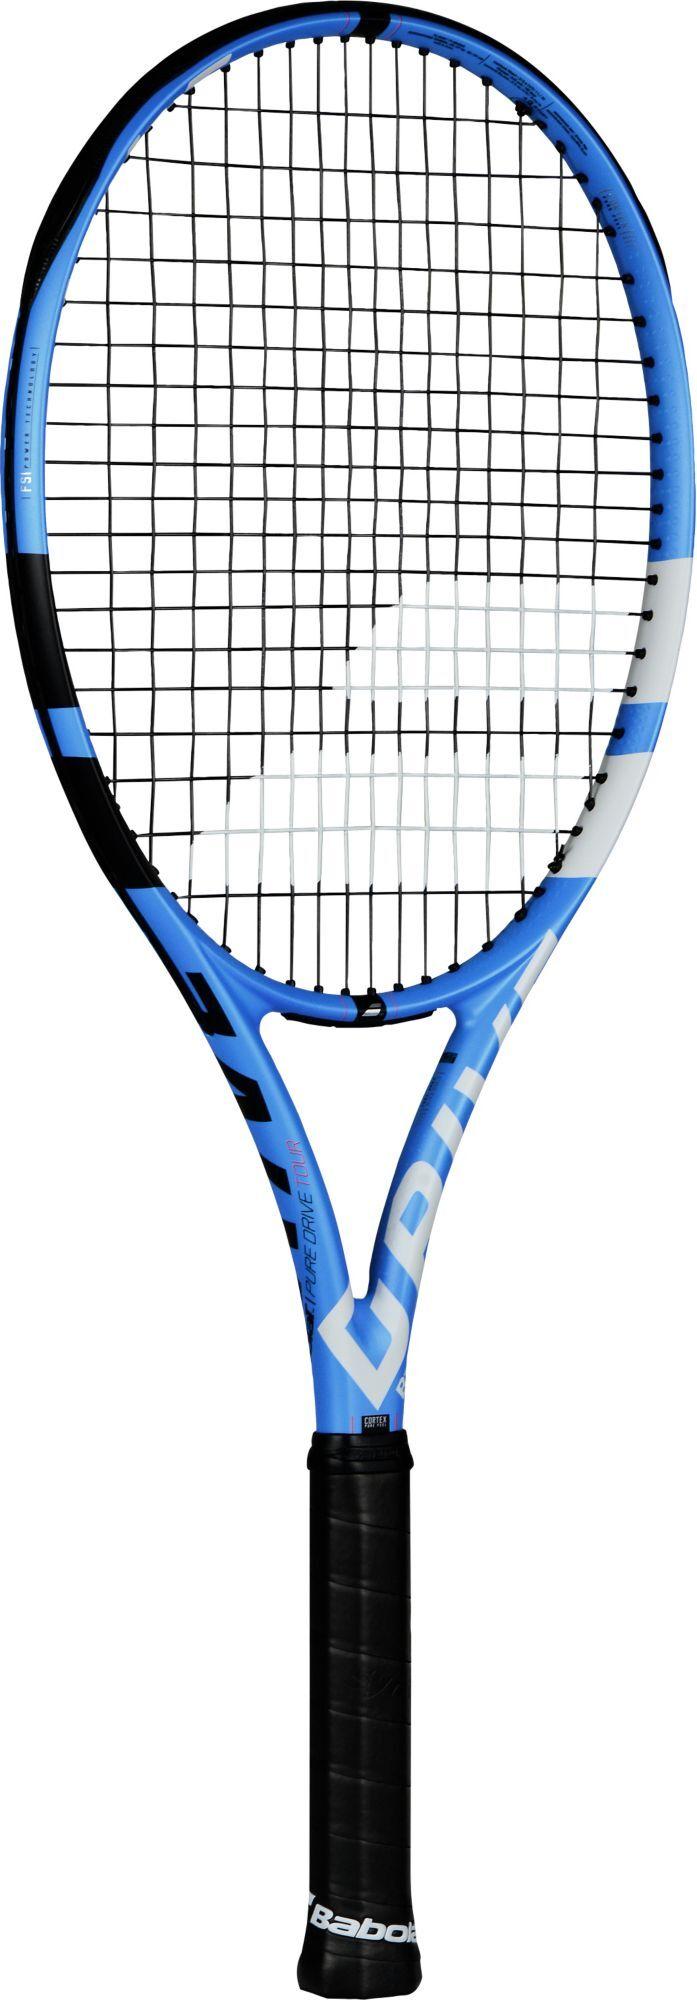 Babolat Pure Drive Tennis Racquet - Unstrung, Size 4 3/8